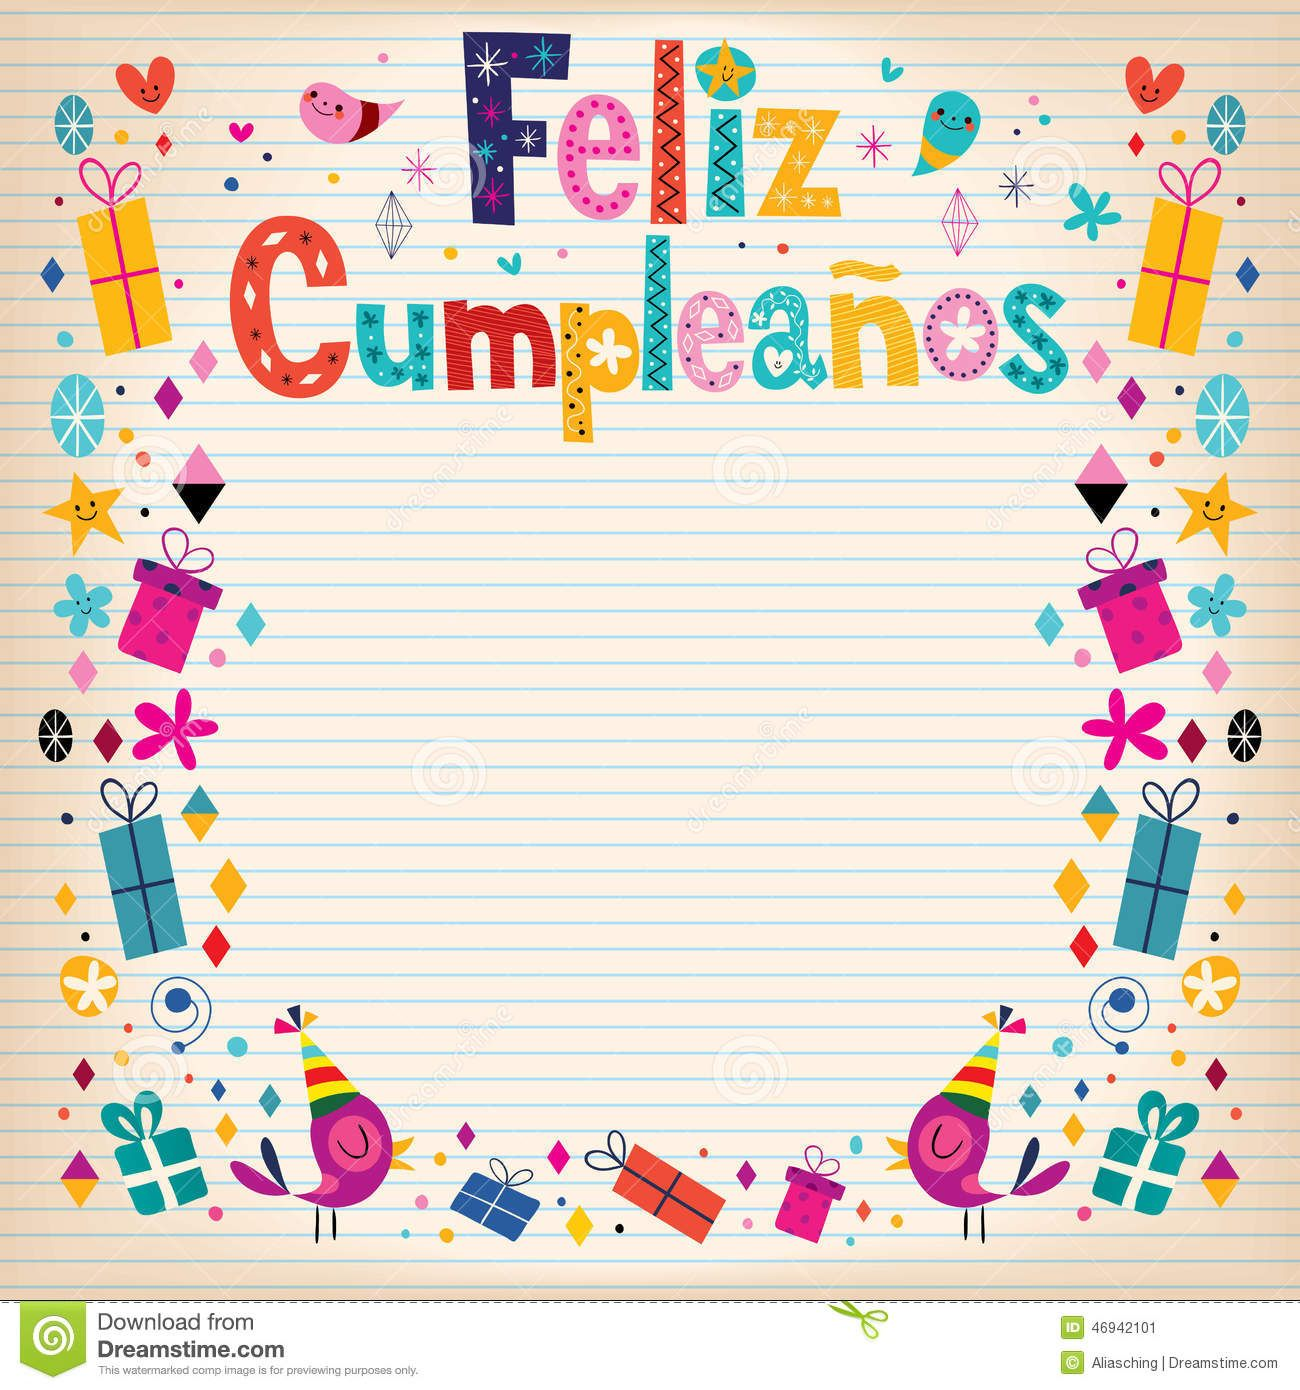 Feliz Cumpleanos - Feliz Cumpleaños En Tarjeta Retra De Papel ...